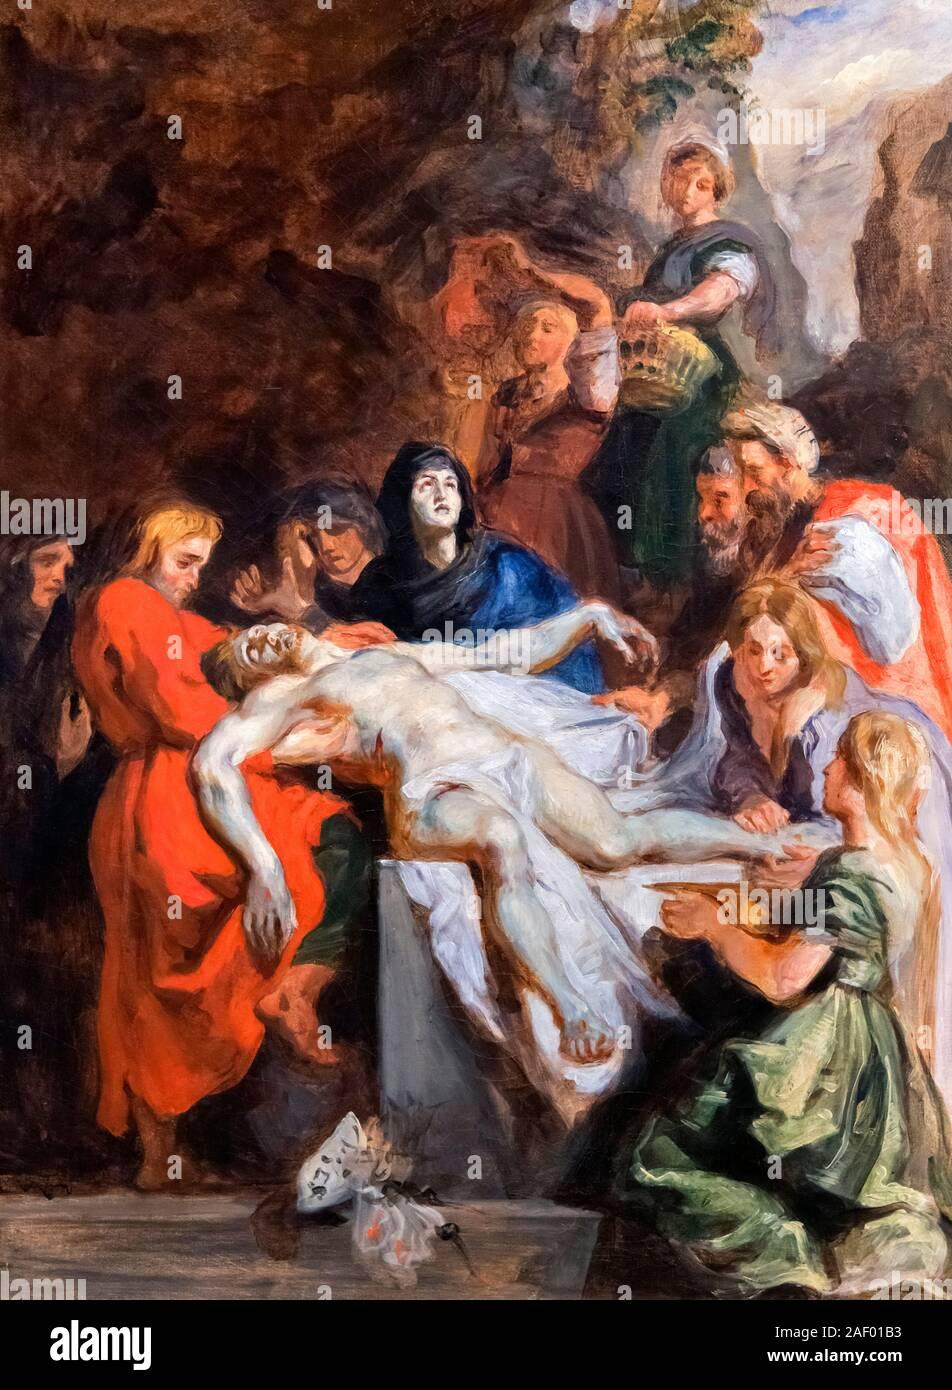 The Entombment (after Peter Paul Rubens) by Eugène Delacroix (1798-1863), oil on canvas, 1836 Stock Photo